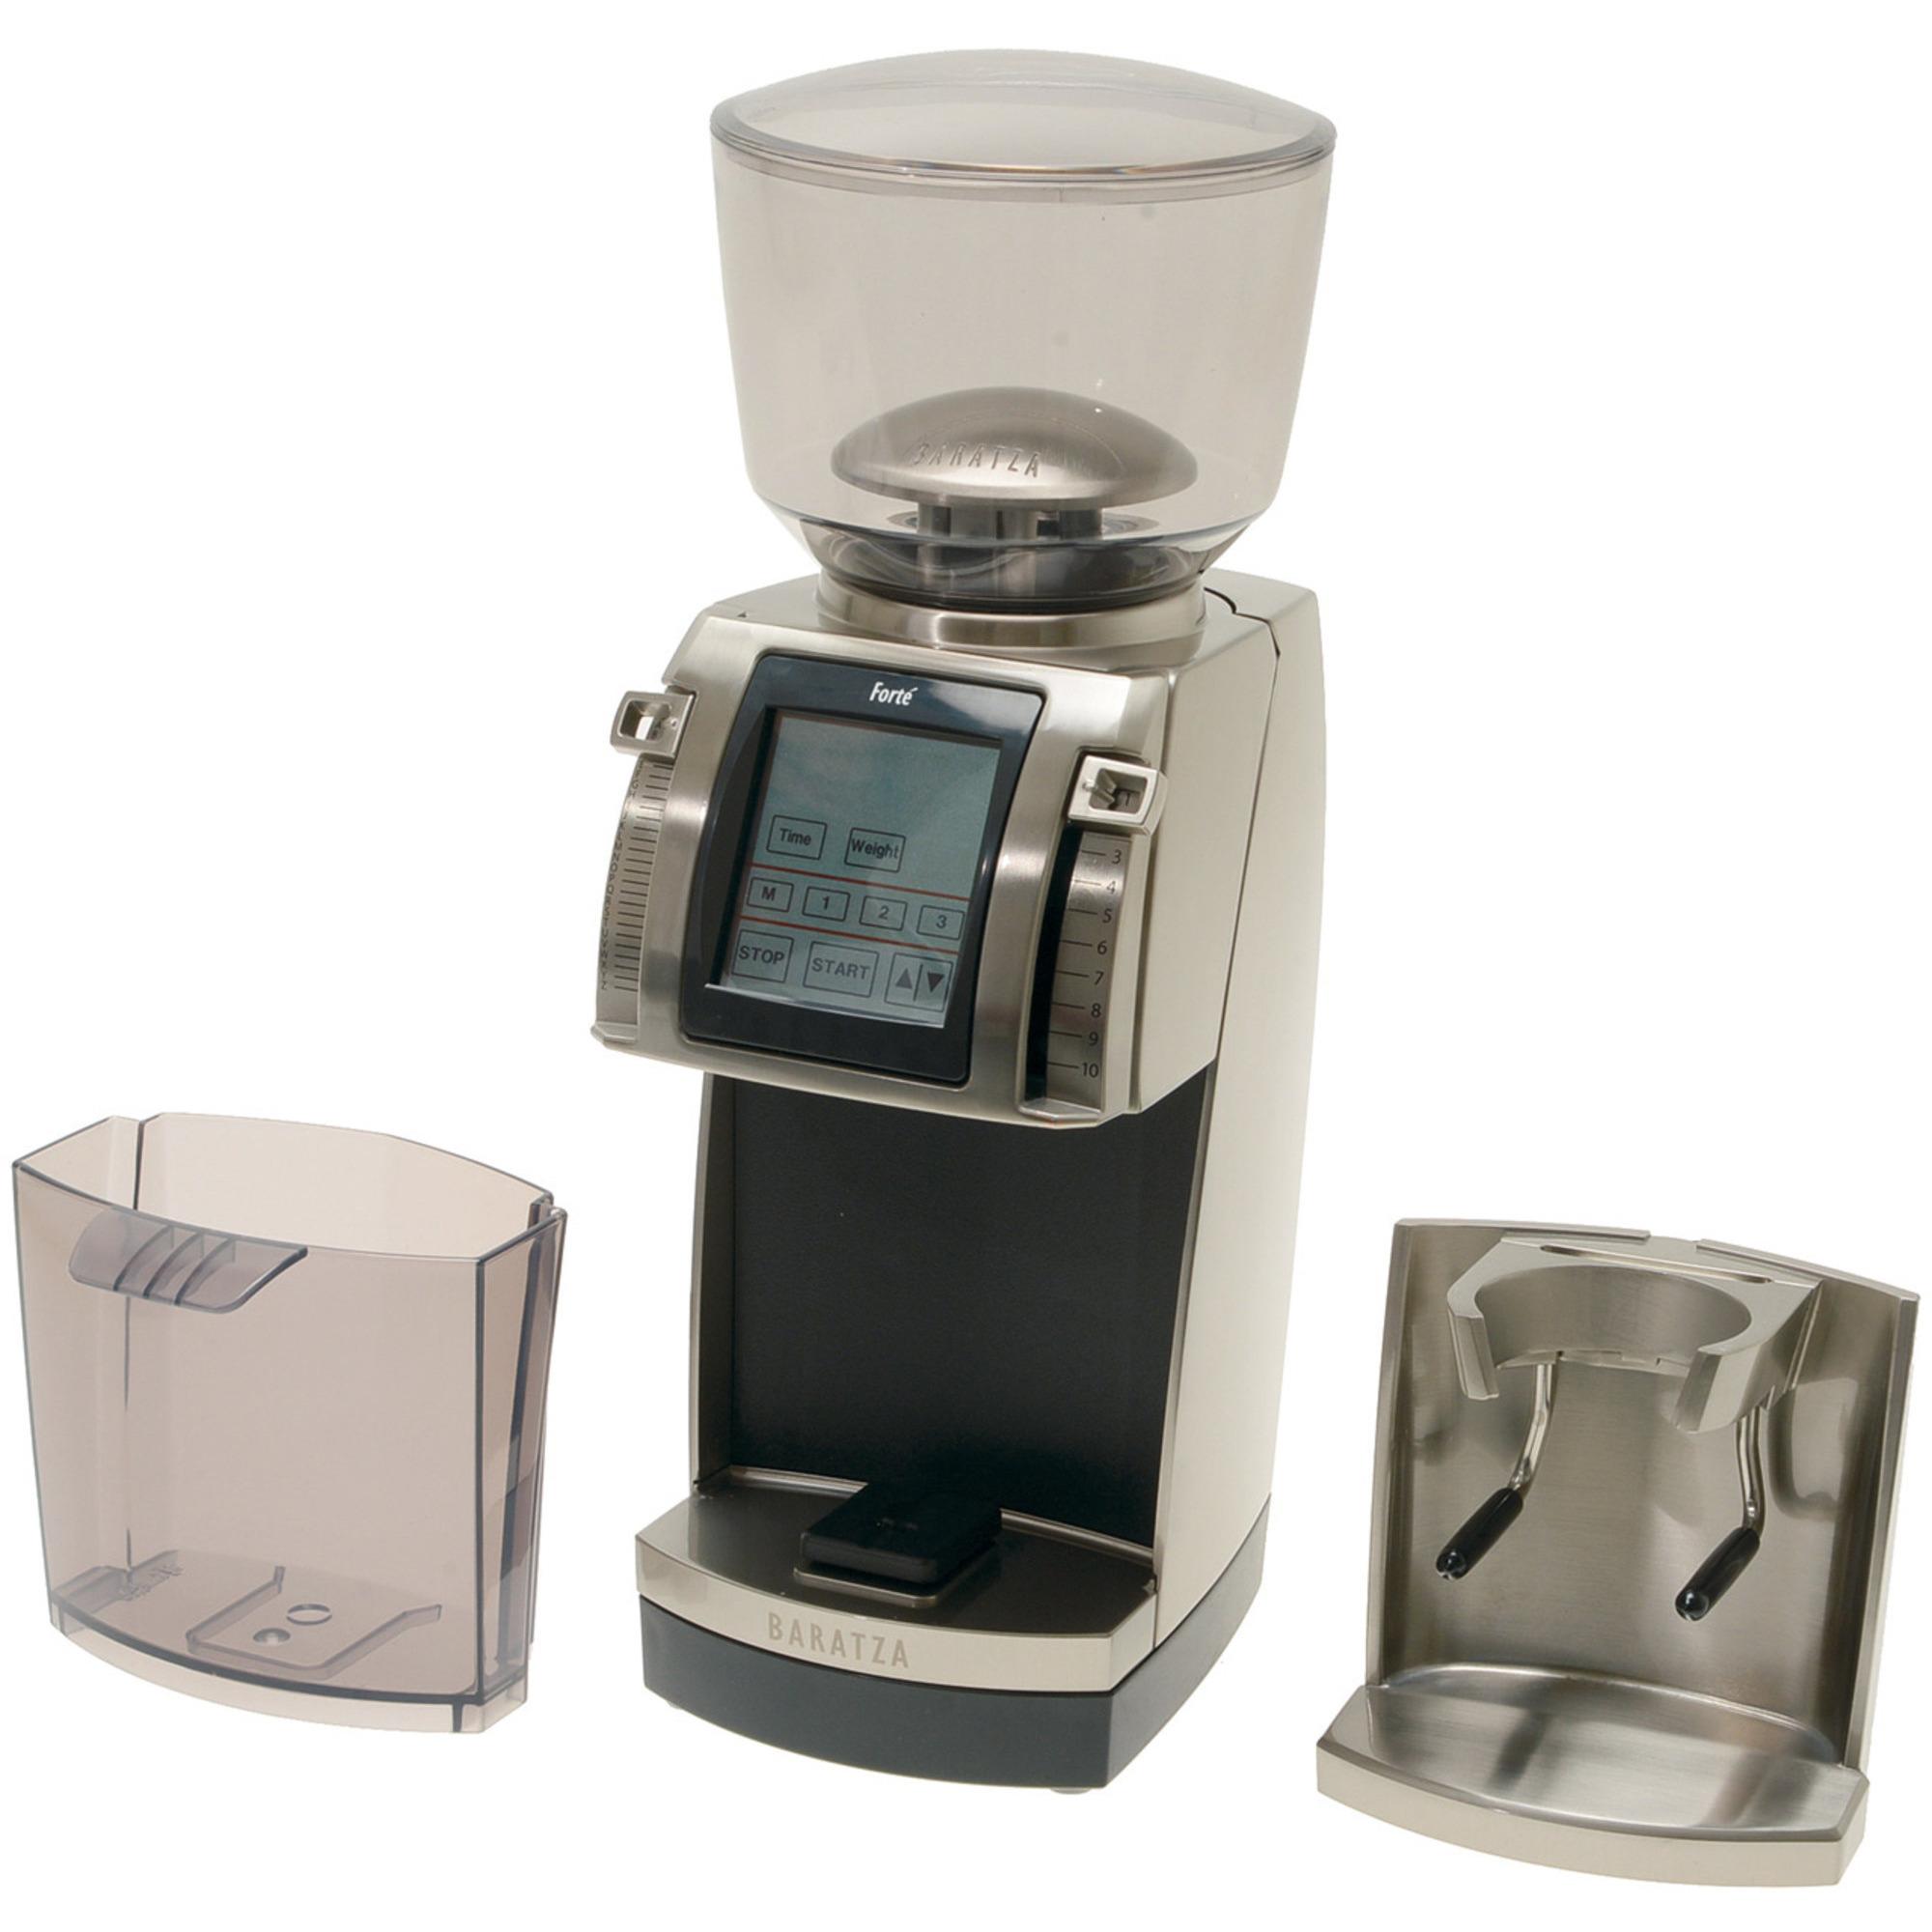 Baratza Forté Kaffekvarn